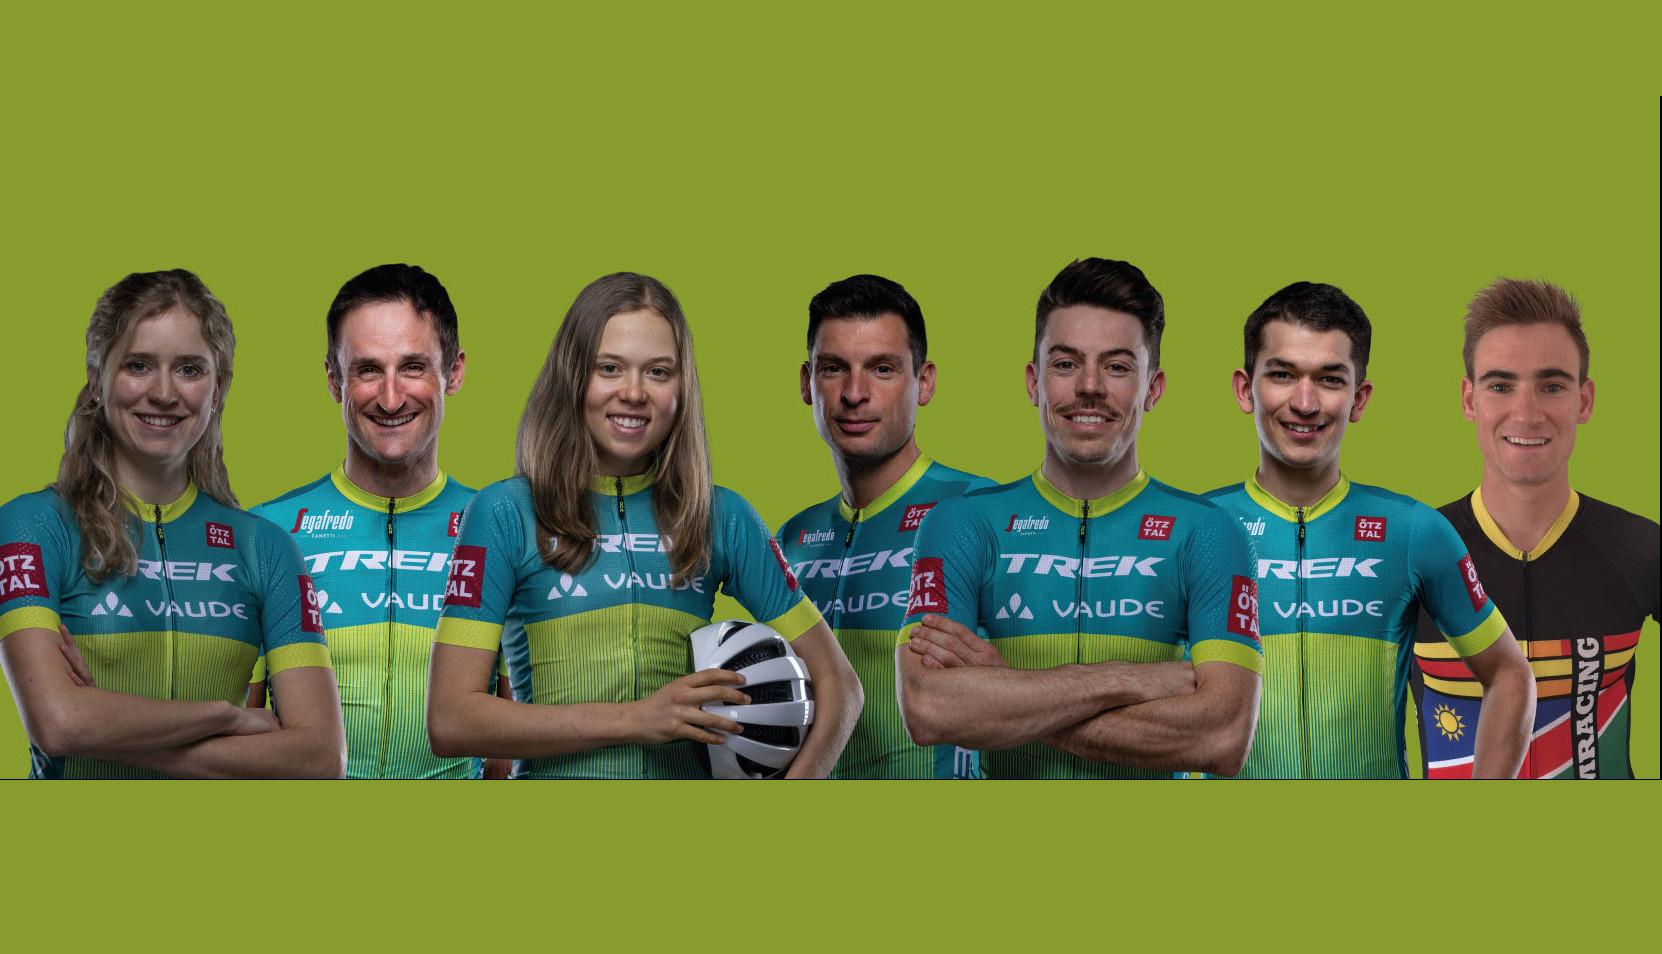 Team Trek Vaude